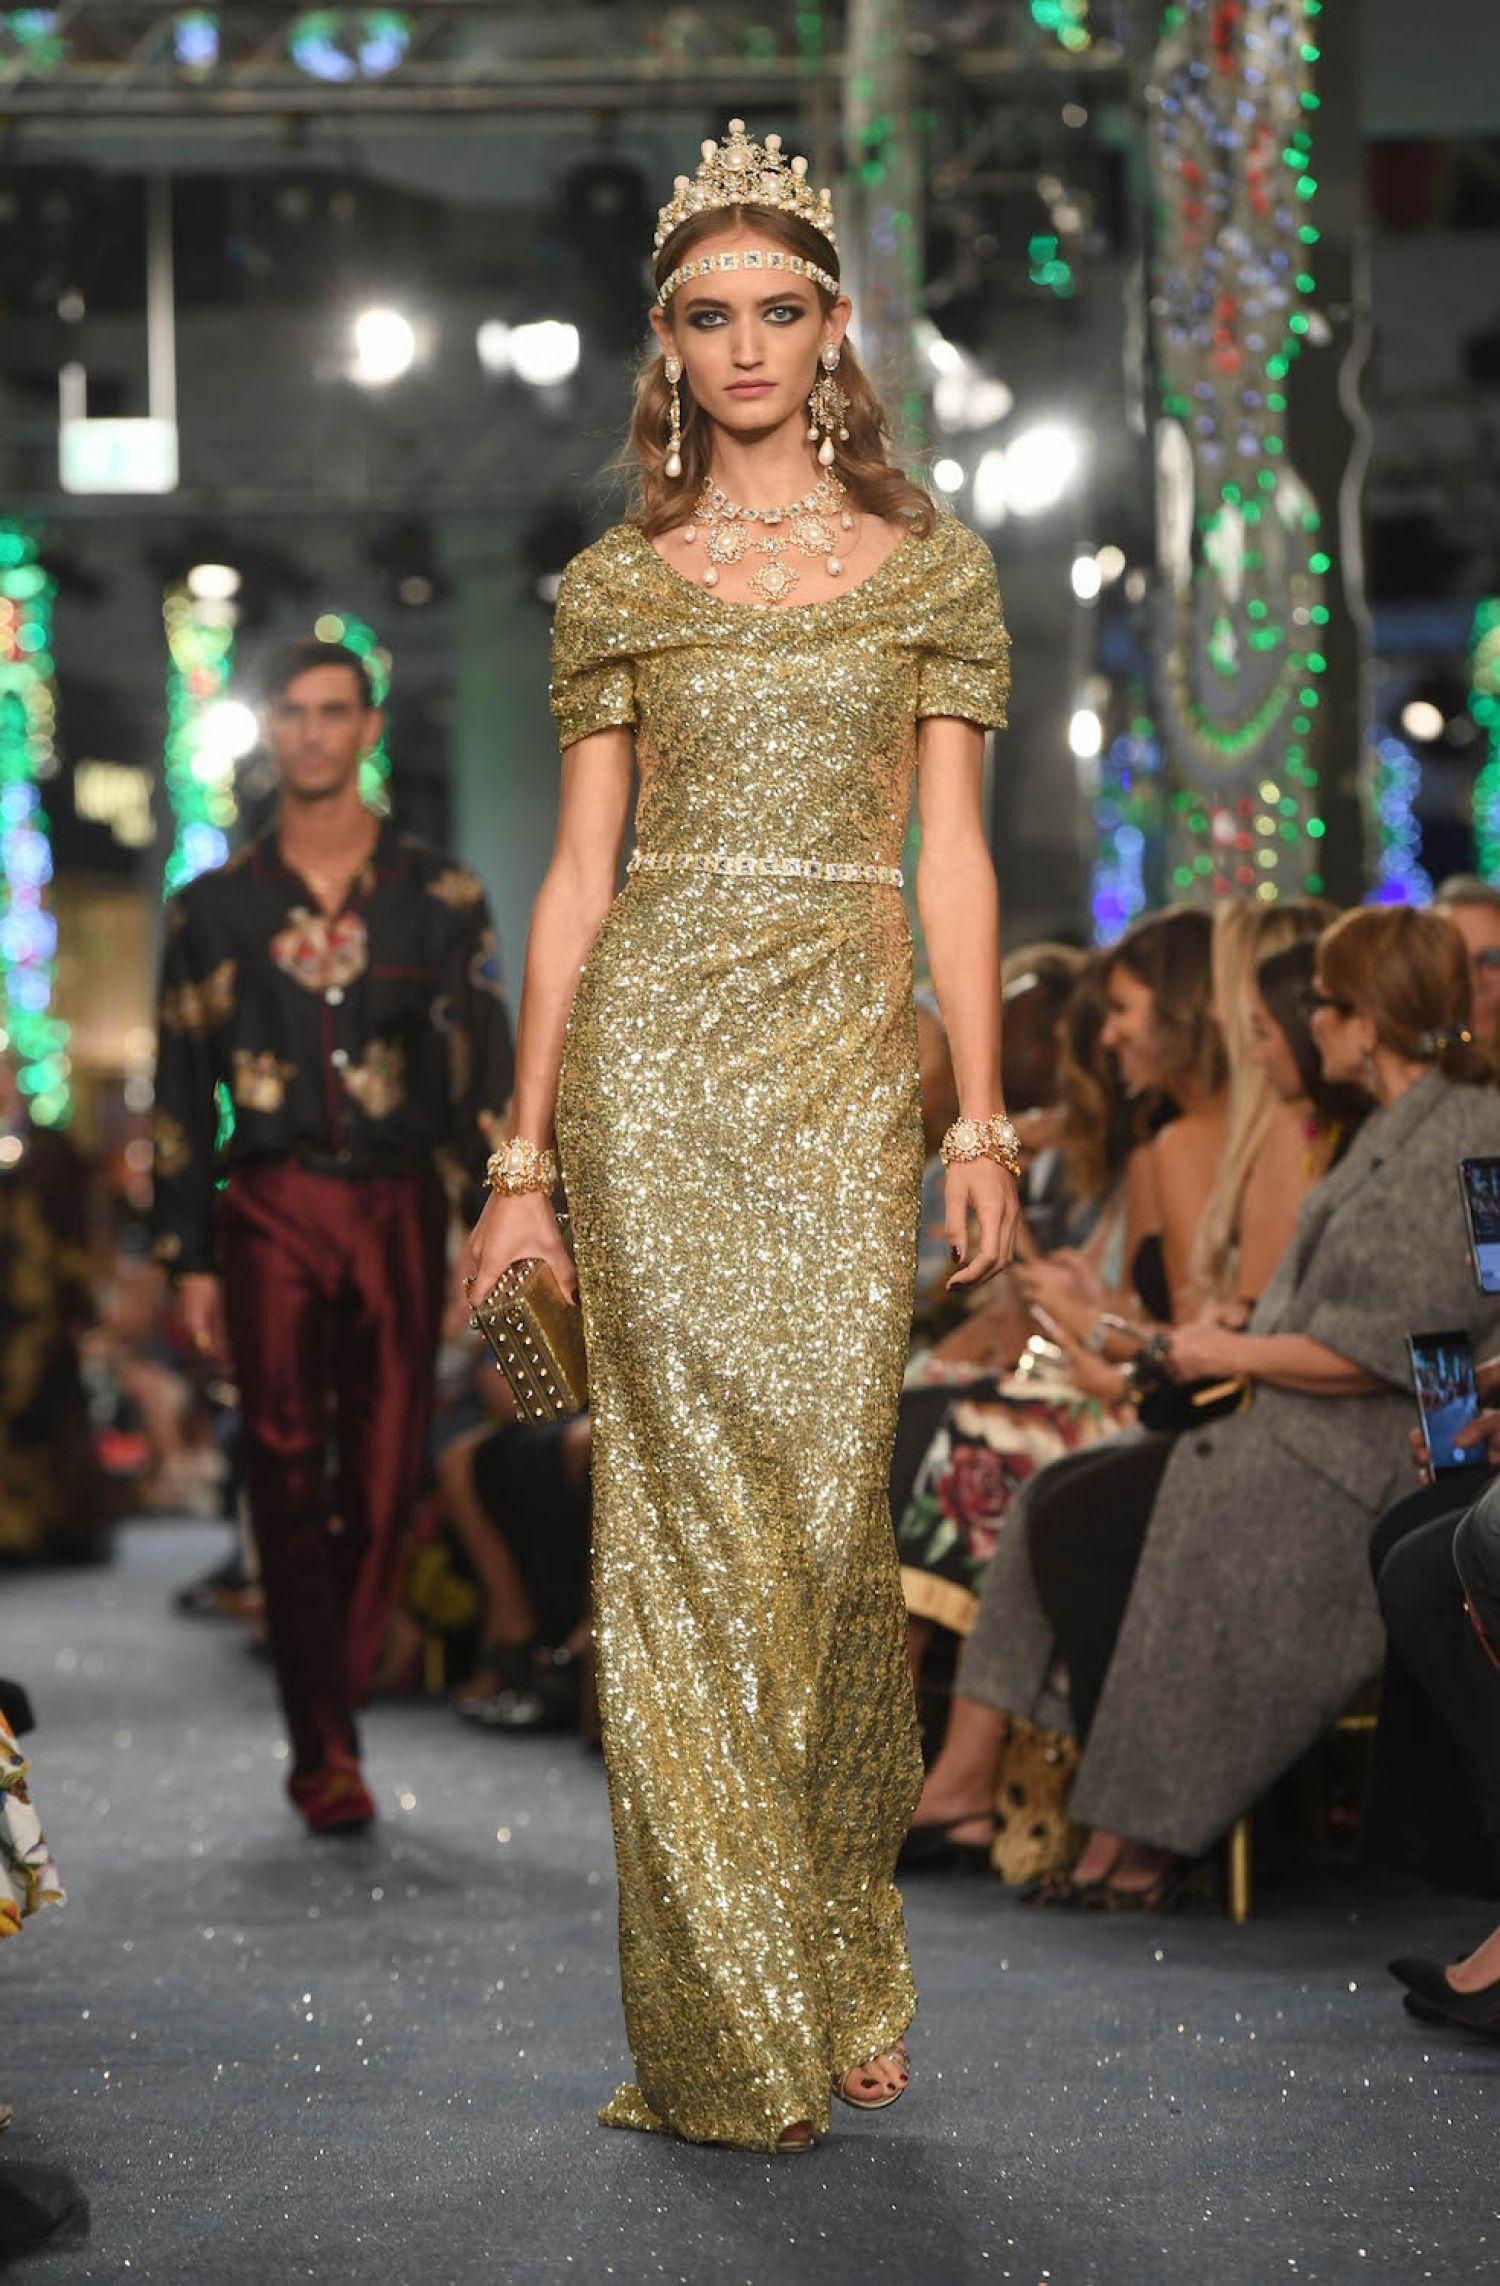 c27fce3dc A Review of the Dolce & Gabbana Runway Show in Dubai - Savoir Flair ...